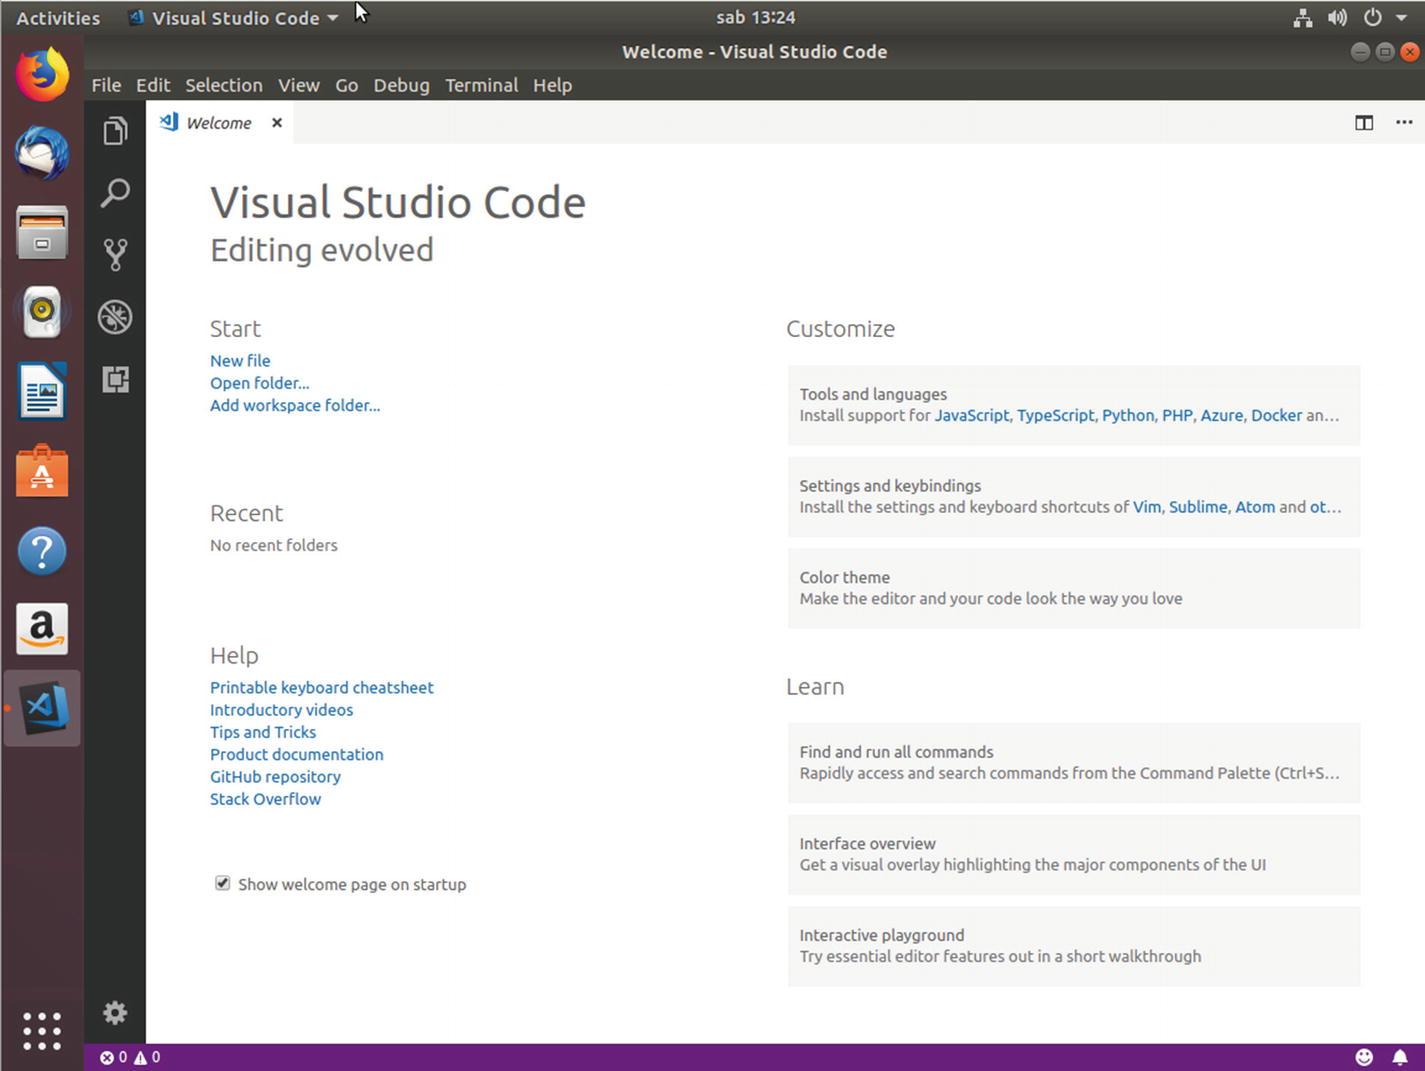 Introducing Visual Studio Code   SpringerLink